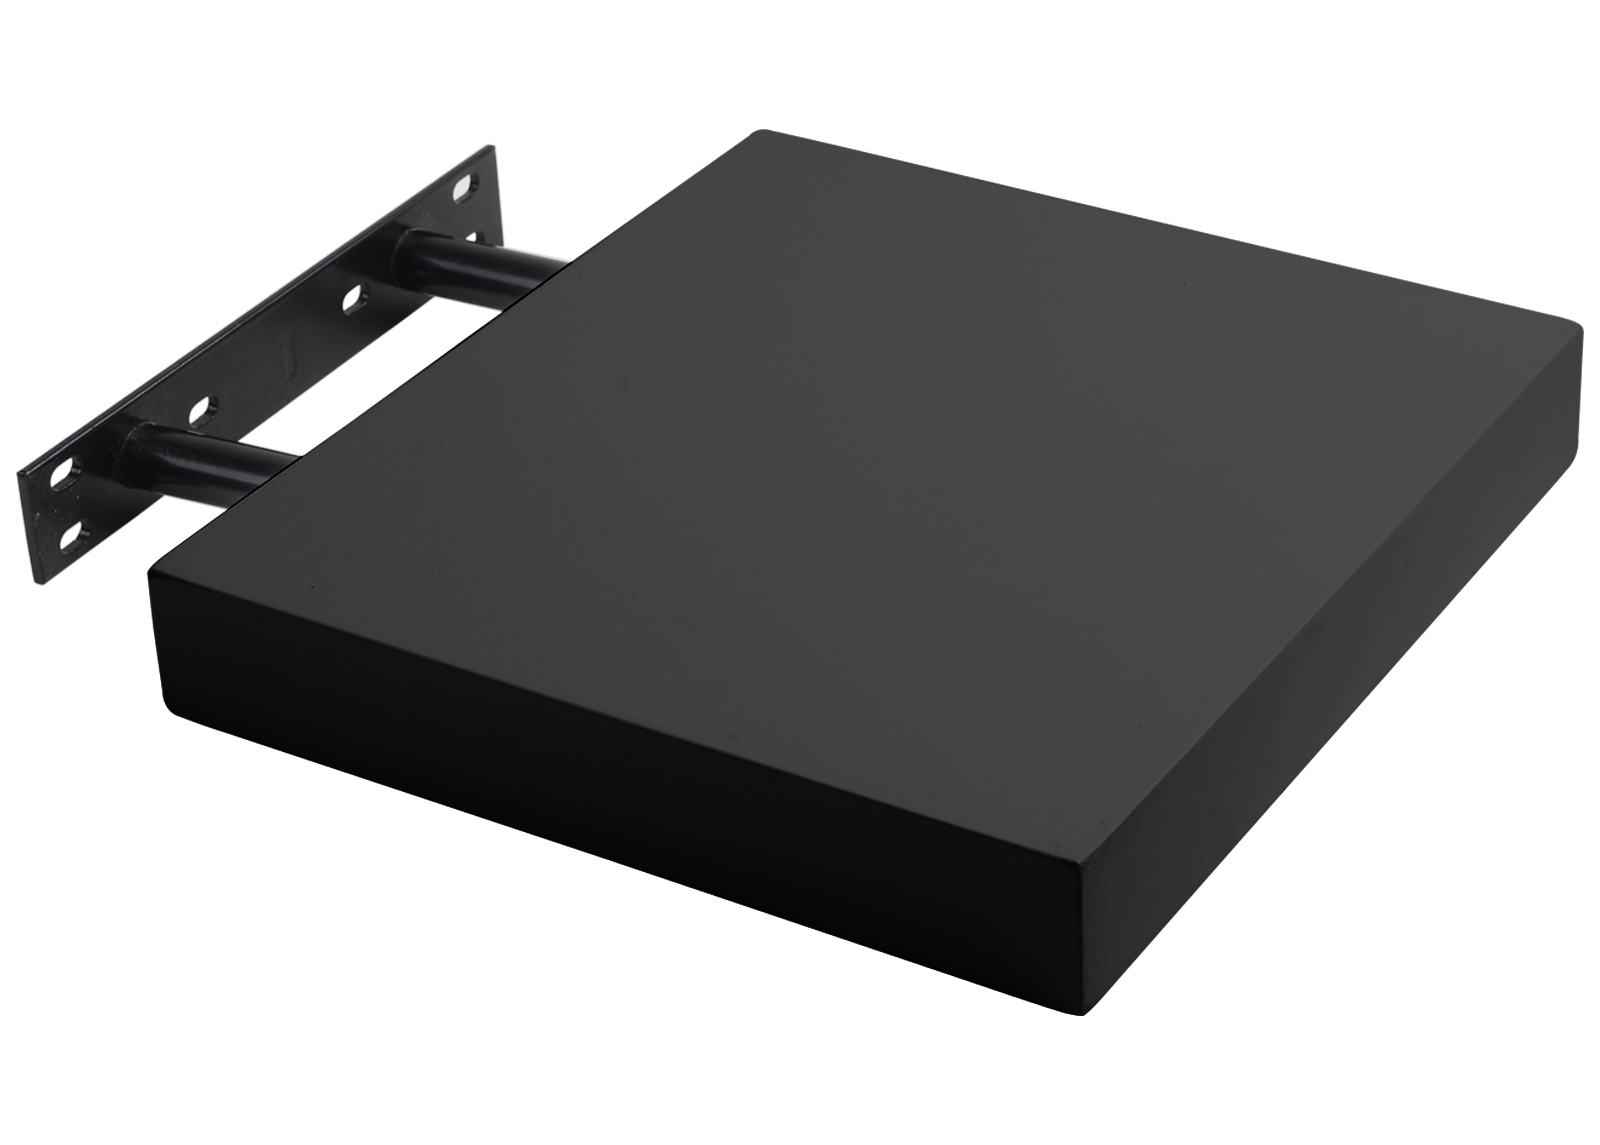 woltu wandregal wandboard buchregal h ngeregal dvd regal schwarz 30cm rg9261sz ebay. Black Bedroom Furniture Sets. Home Design Ideas